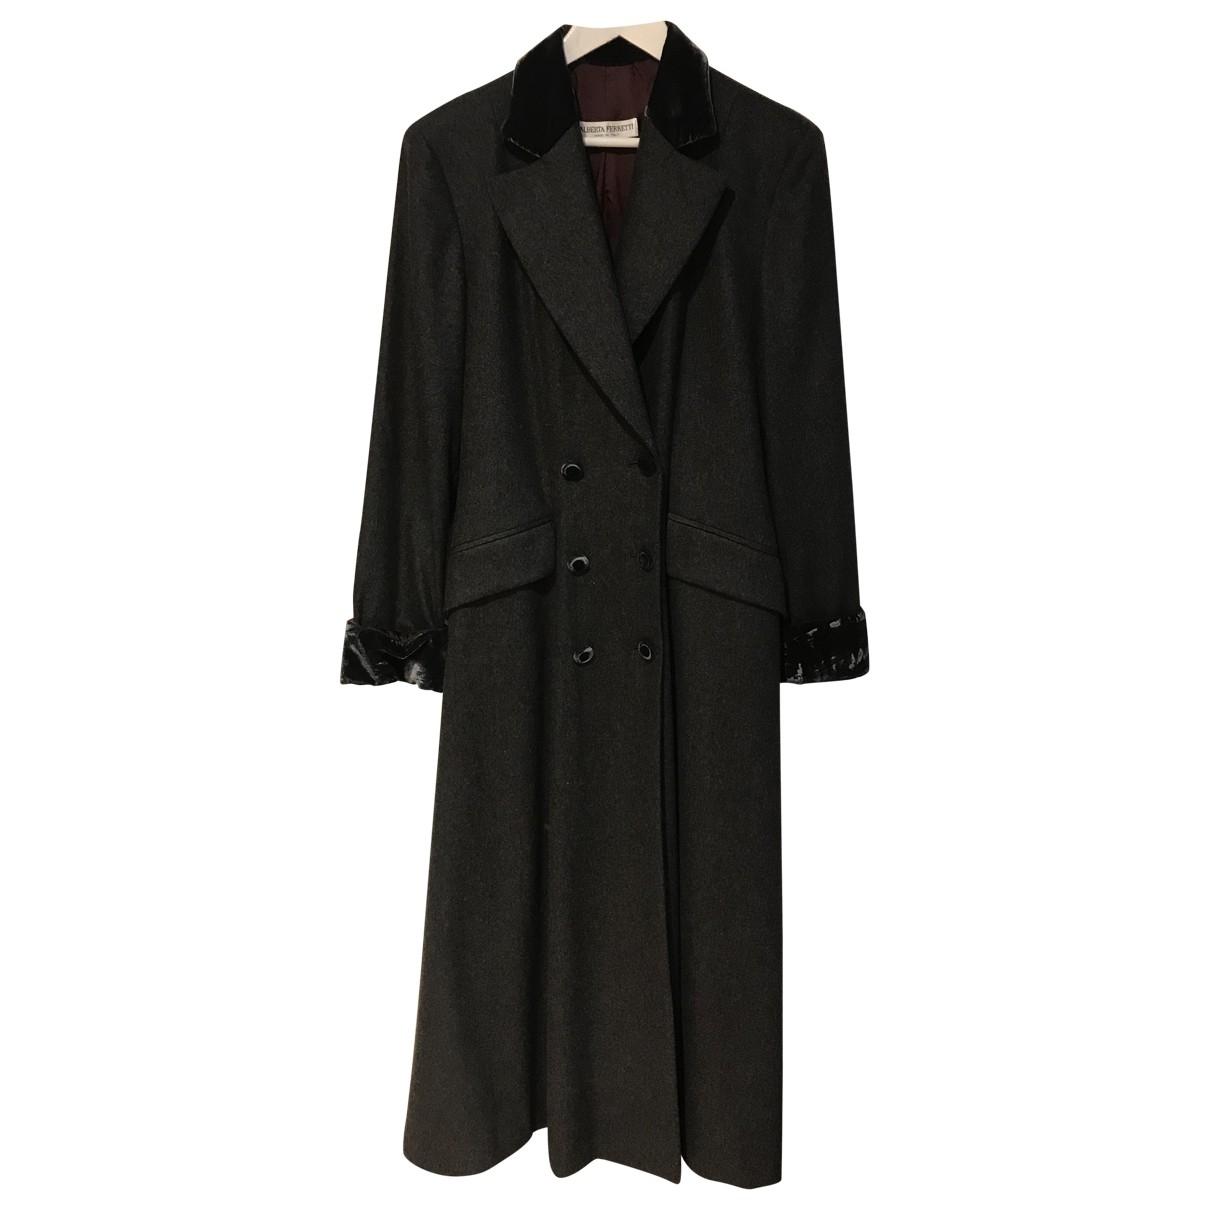 Alberta Ferretti - Manteau   pour femme en laine - multicolore